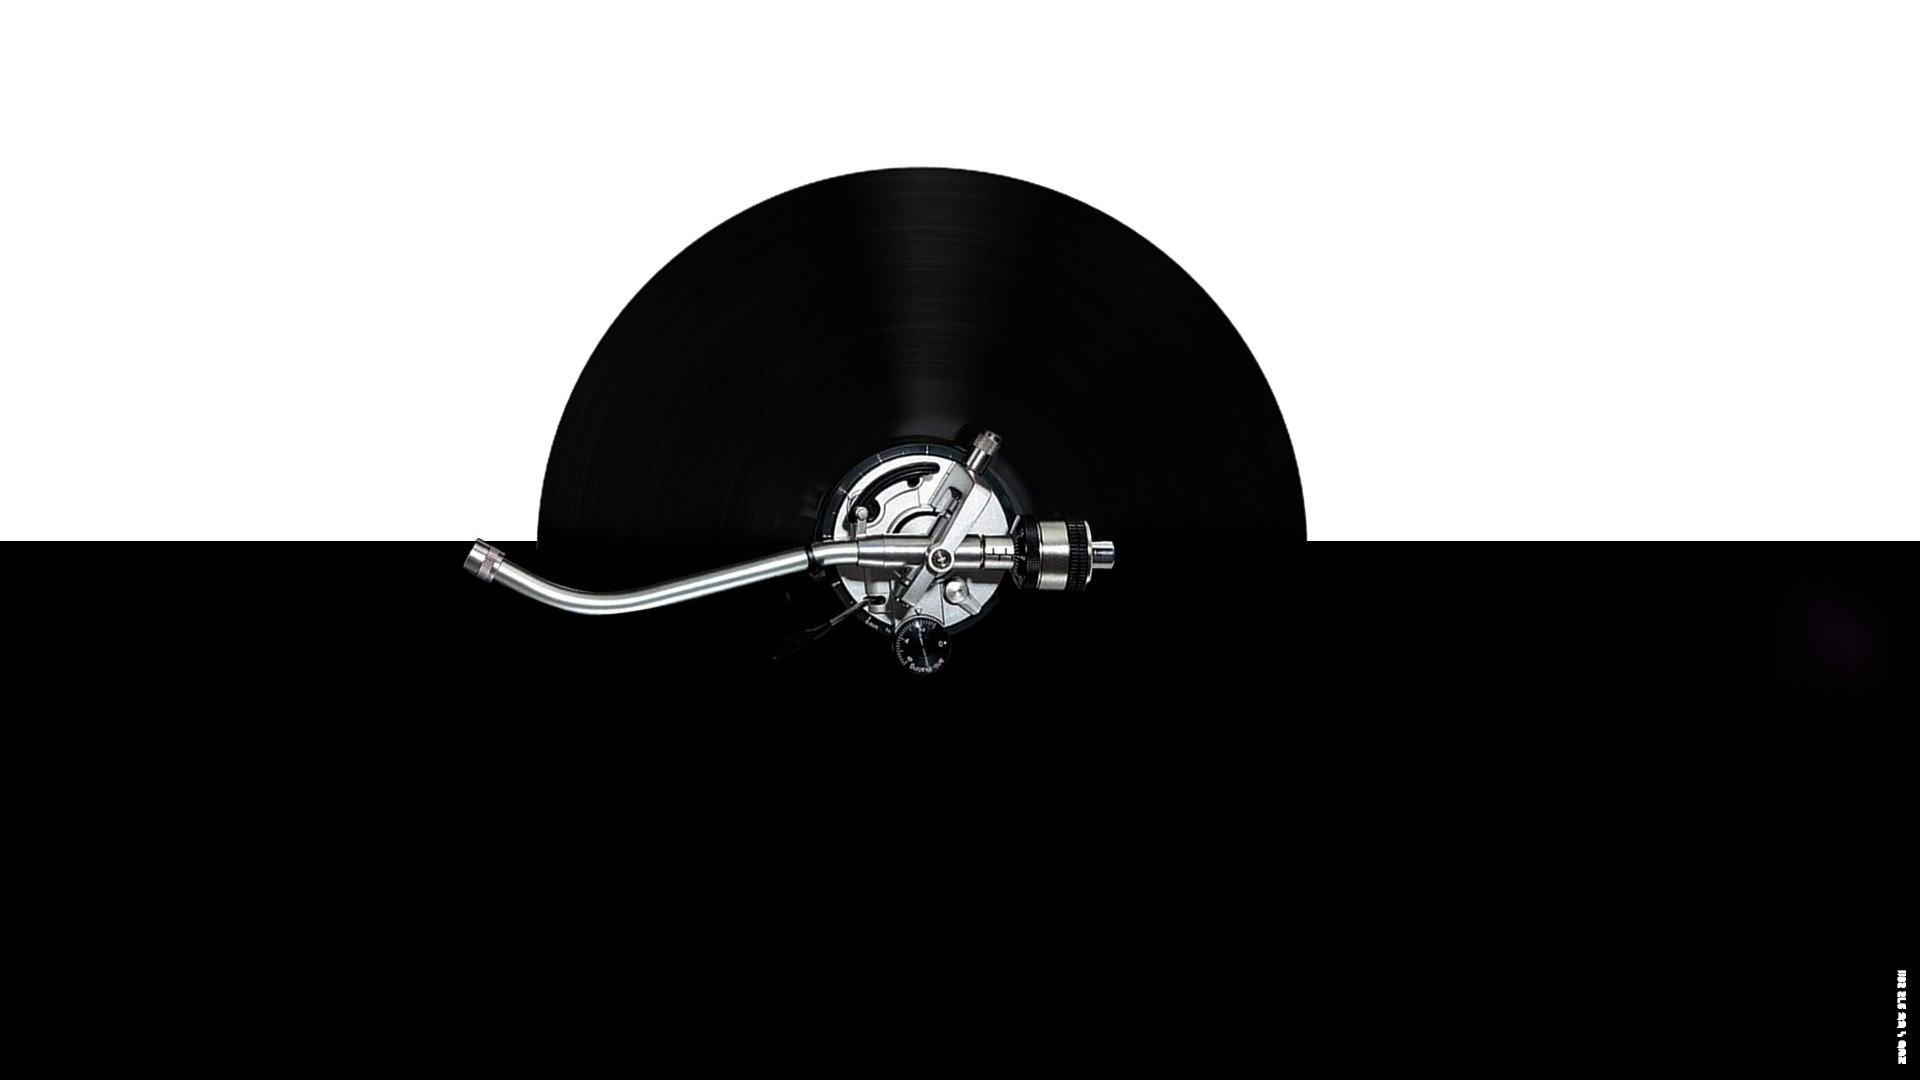 Res: 1920x1080, Black white turntable vinyl turntables technics DJ arms mk2 scratch  wallpaper      262095   WallpaperUP